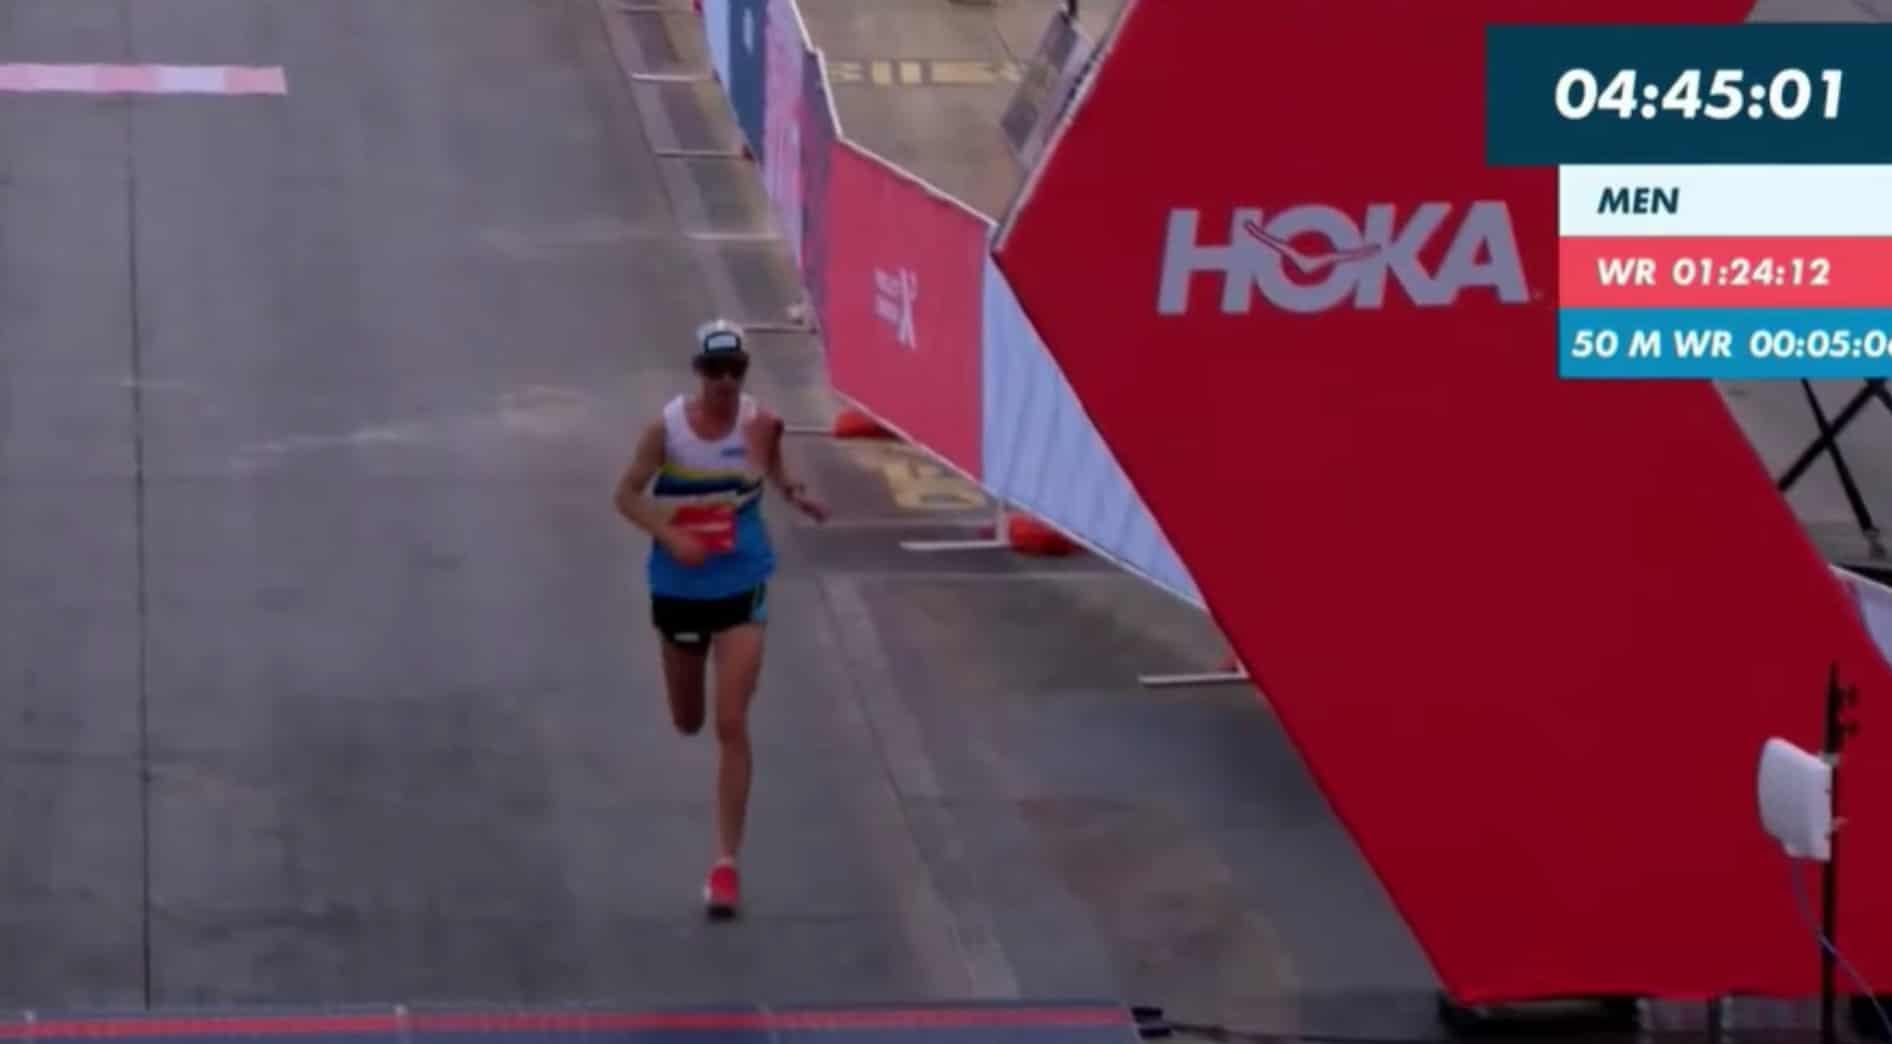 100 kilometer hardlopen en dan 11 seconden tekort komen